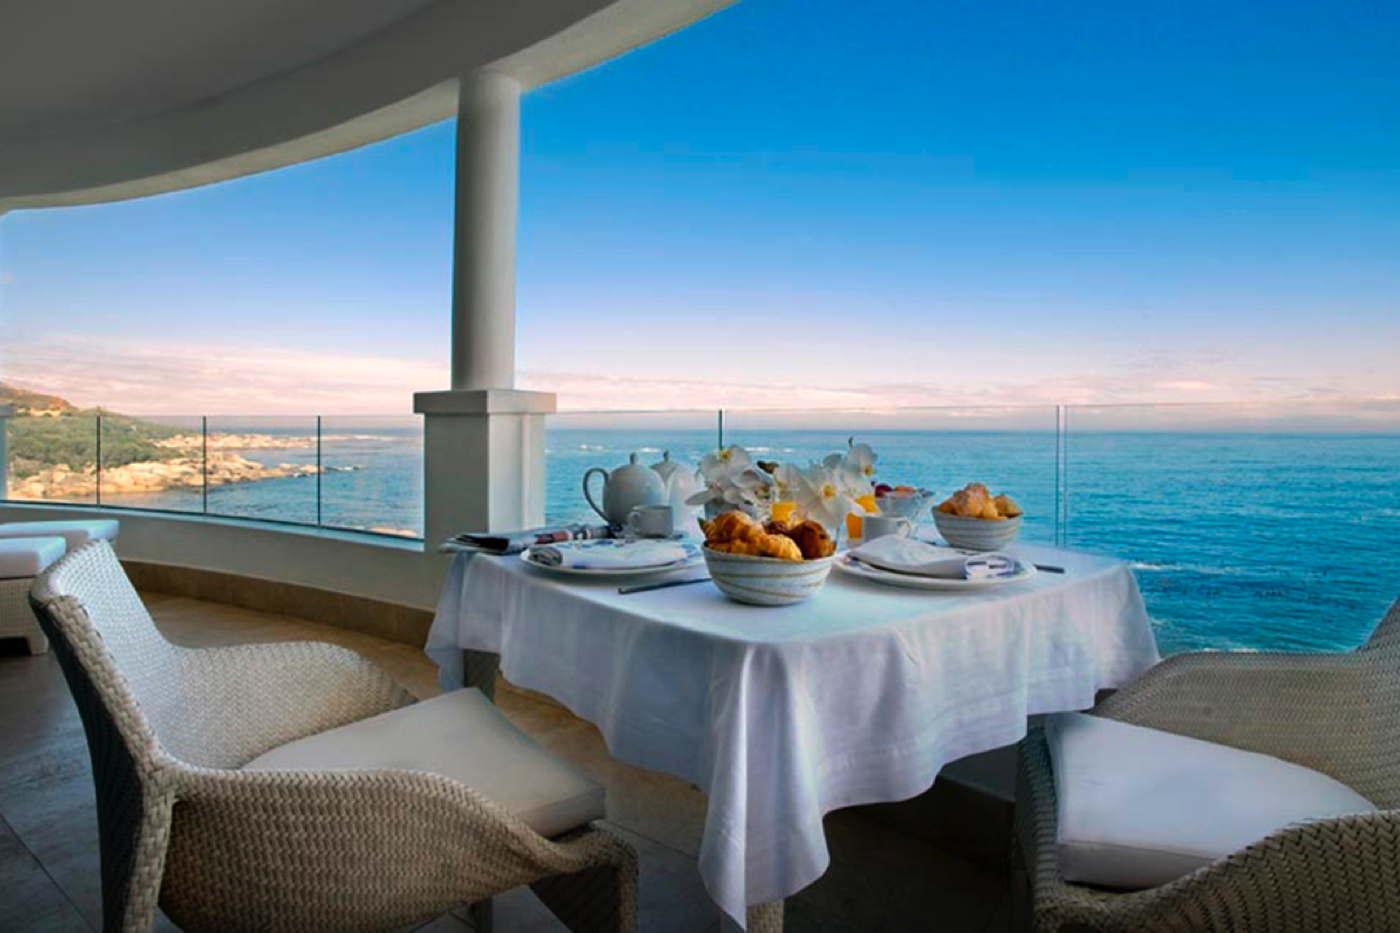 5 sterne boutique hotel luxushotel am meer s dafrika for Boutique hotel am meer